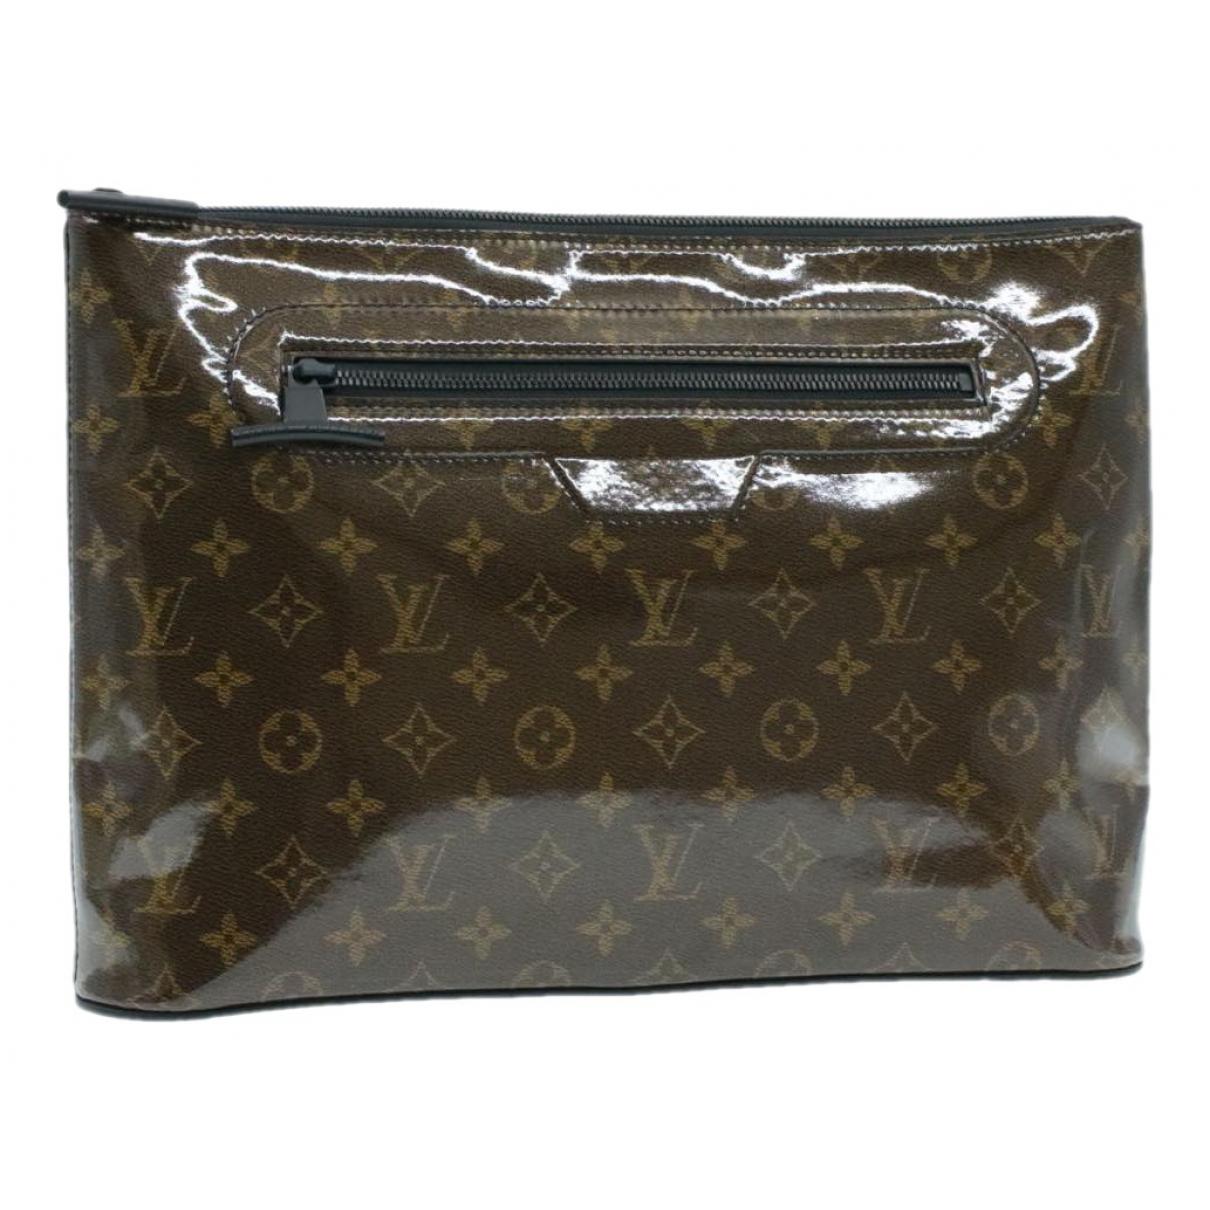 Bolsos clutch en Plastico Marron Louis Vuitton